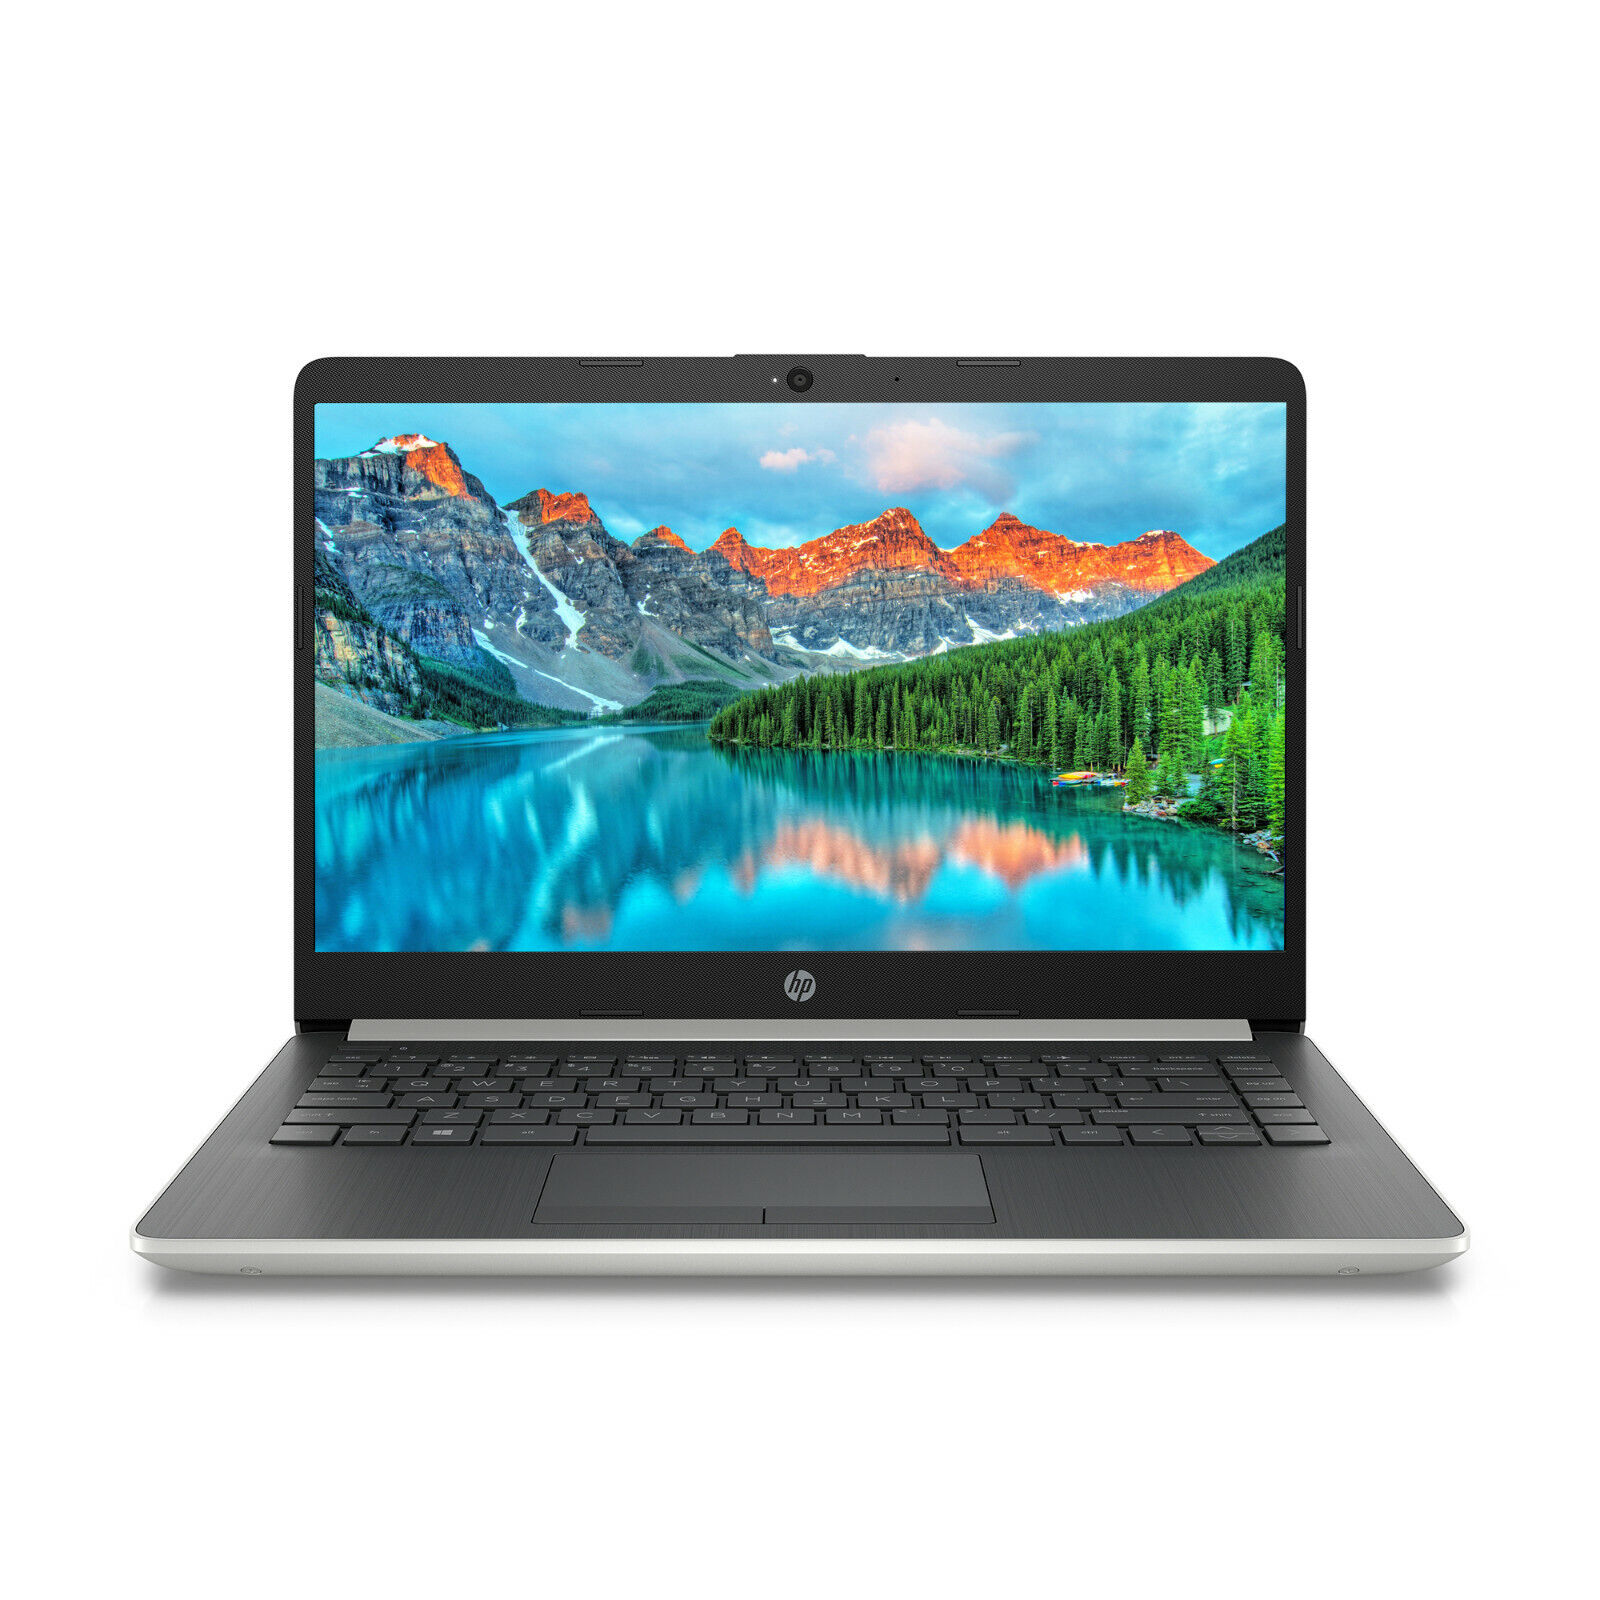 new-hp-14-hd-amd-ryzen-3-3-5ghz-4gb-128gb-ssd-radeon-vega-3-windows-10-laptop